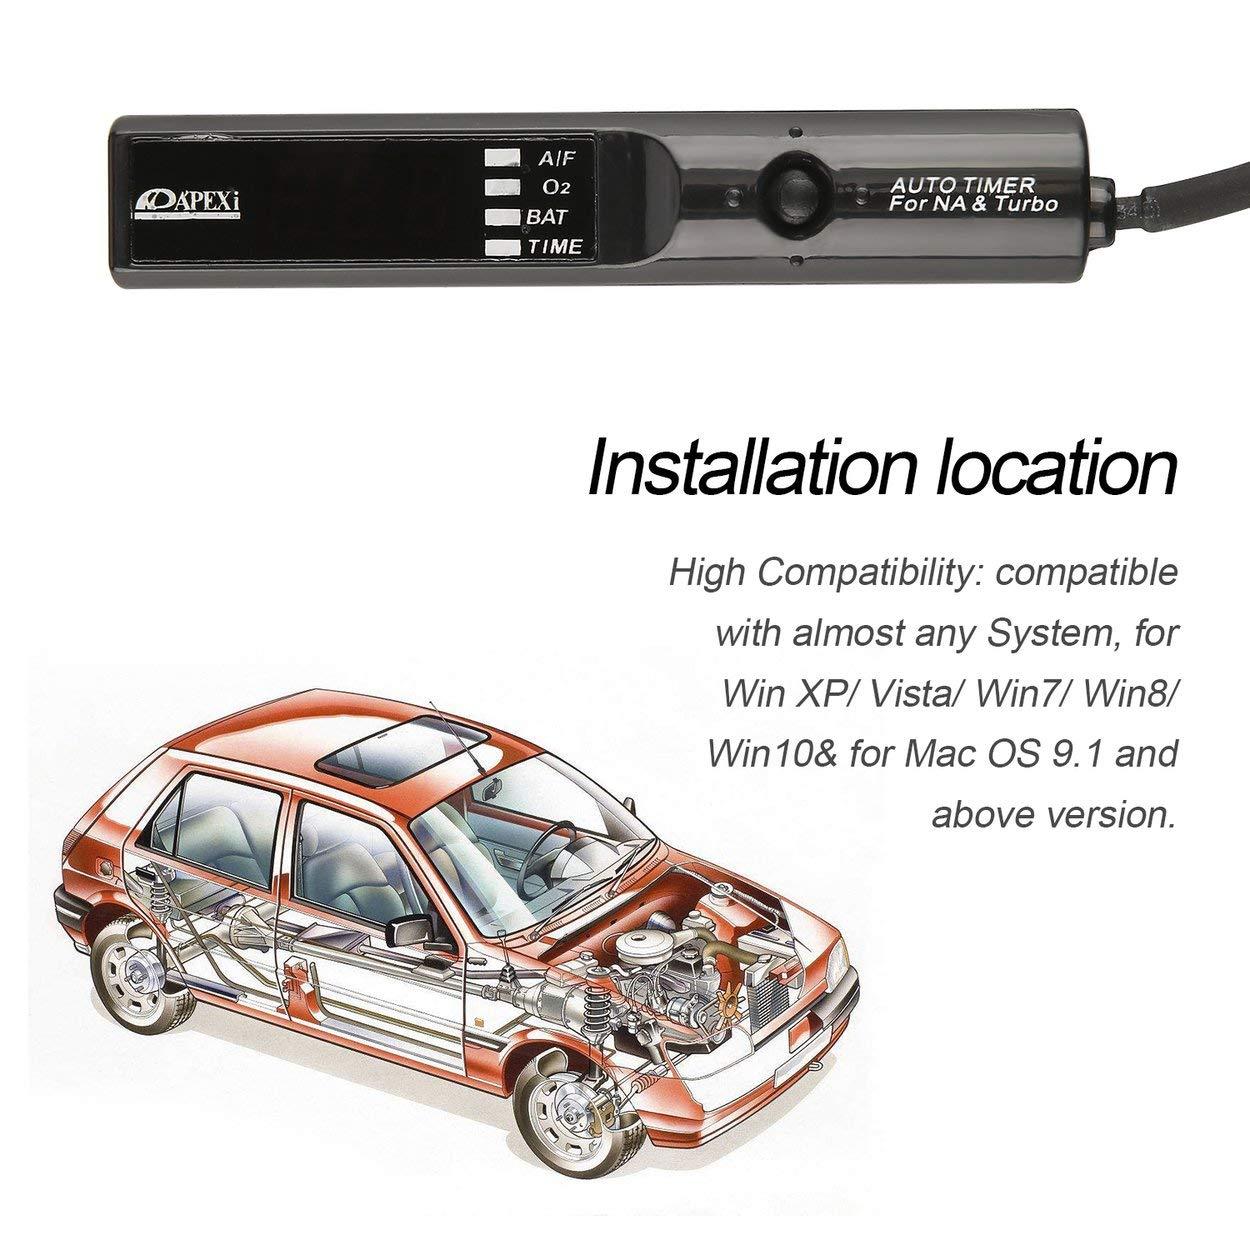 Lorenlli 12 V Pantalla LED Digital Roja Programable Auto Car Turbo Timer Medidor de Vehículo Dispositivo Pen Control Unit Power Refit Tutamen Herramientas: ...